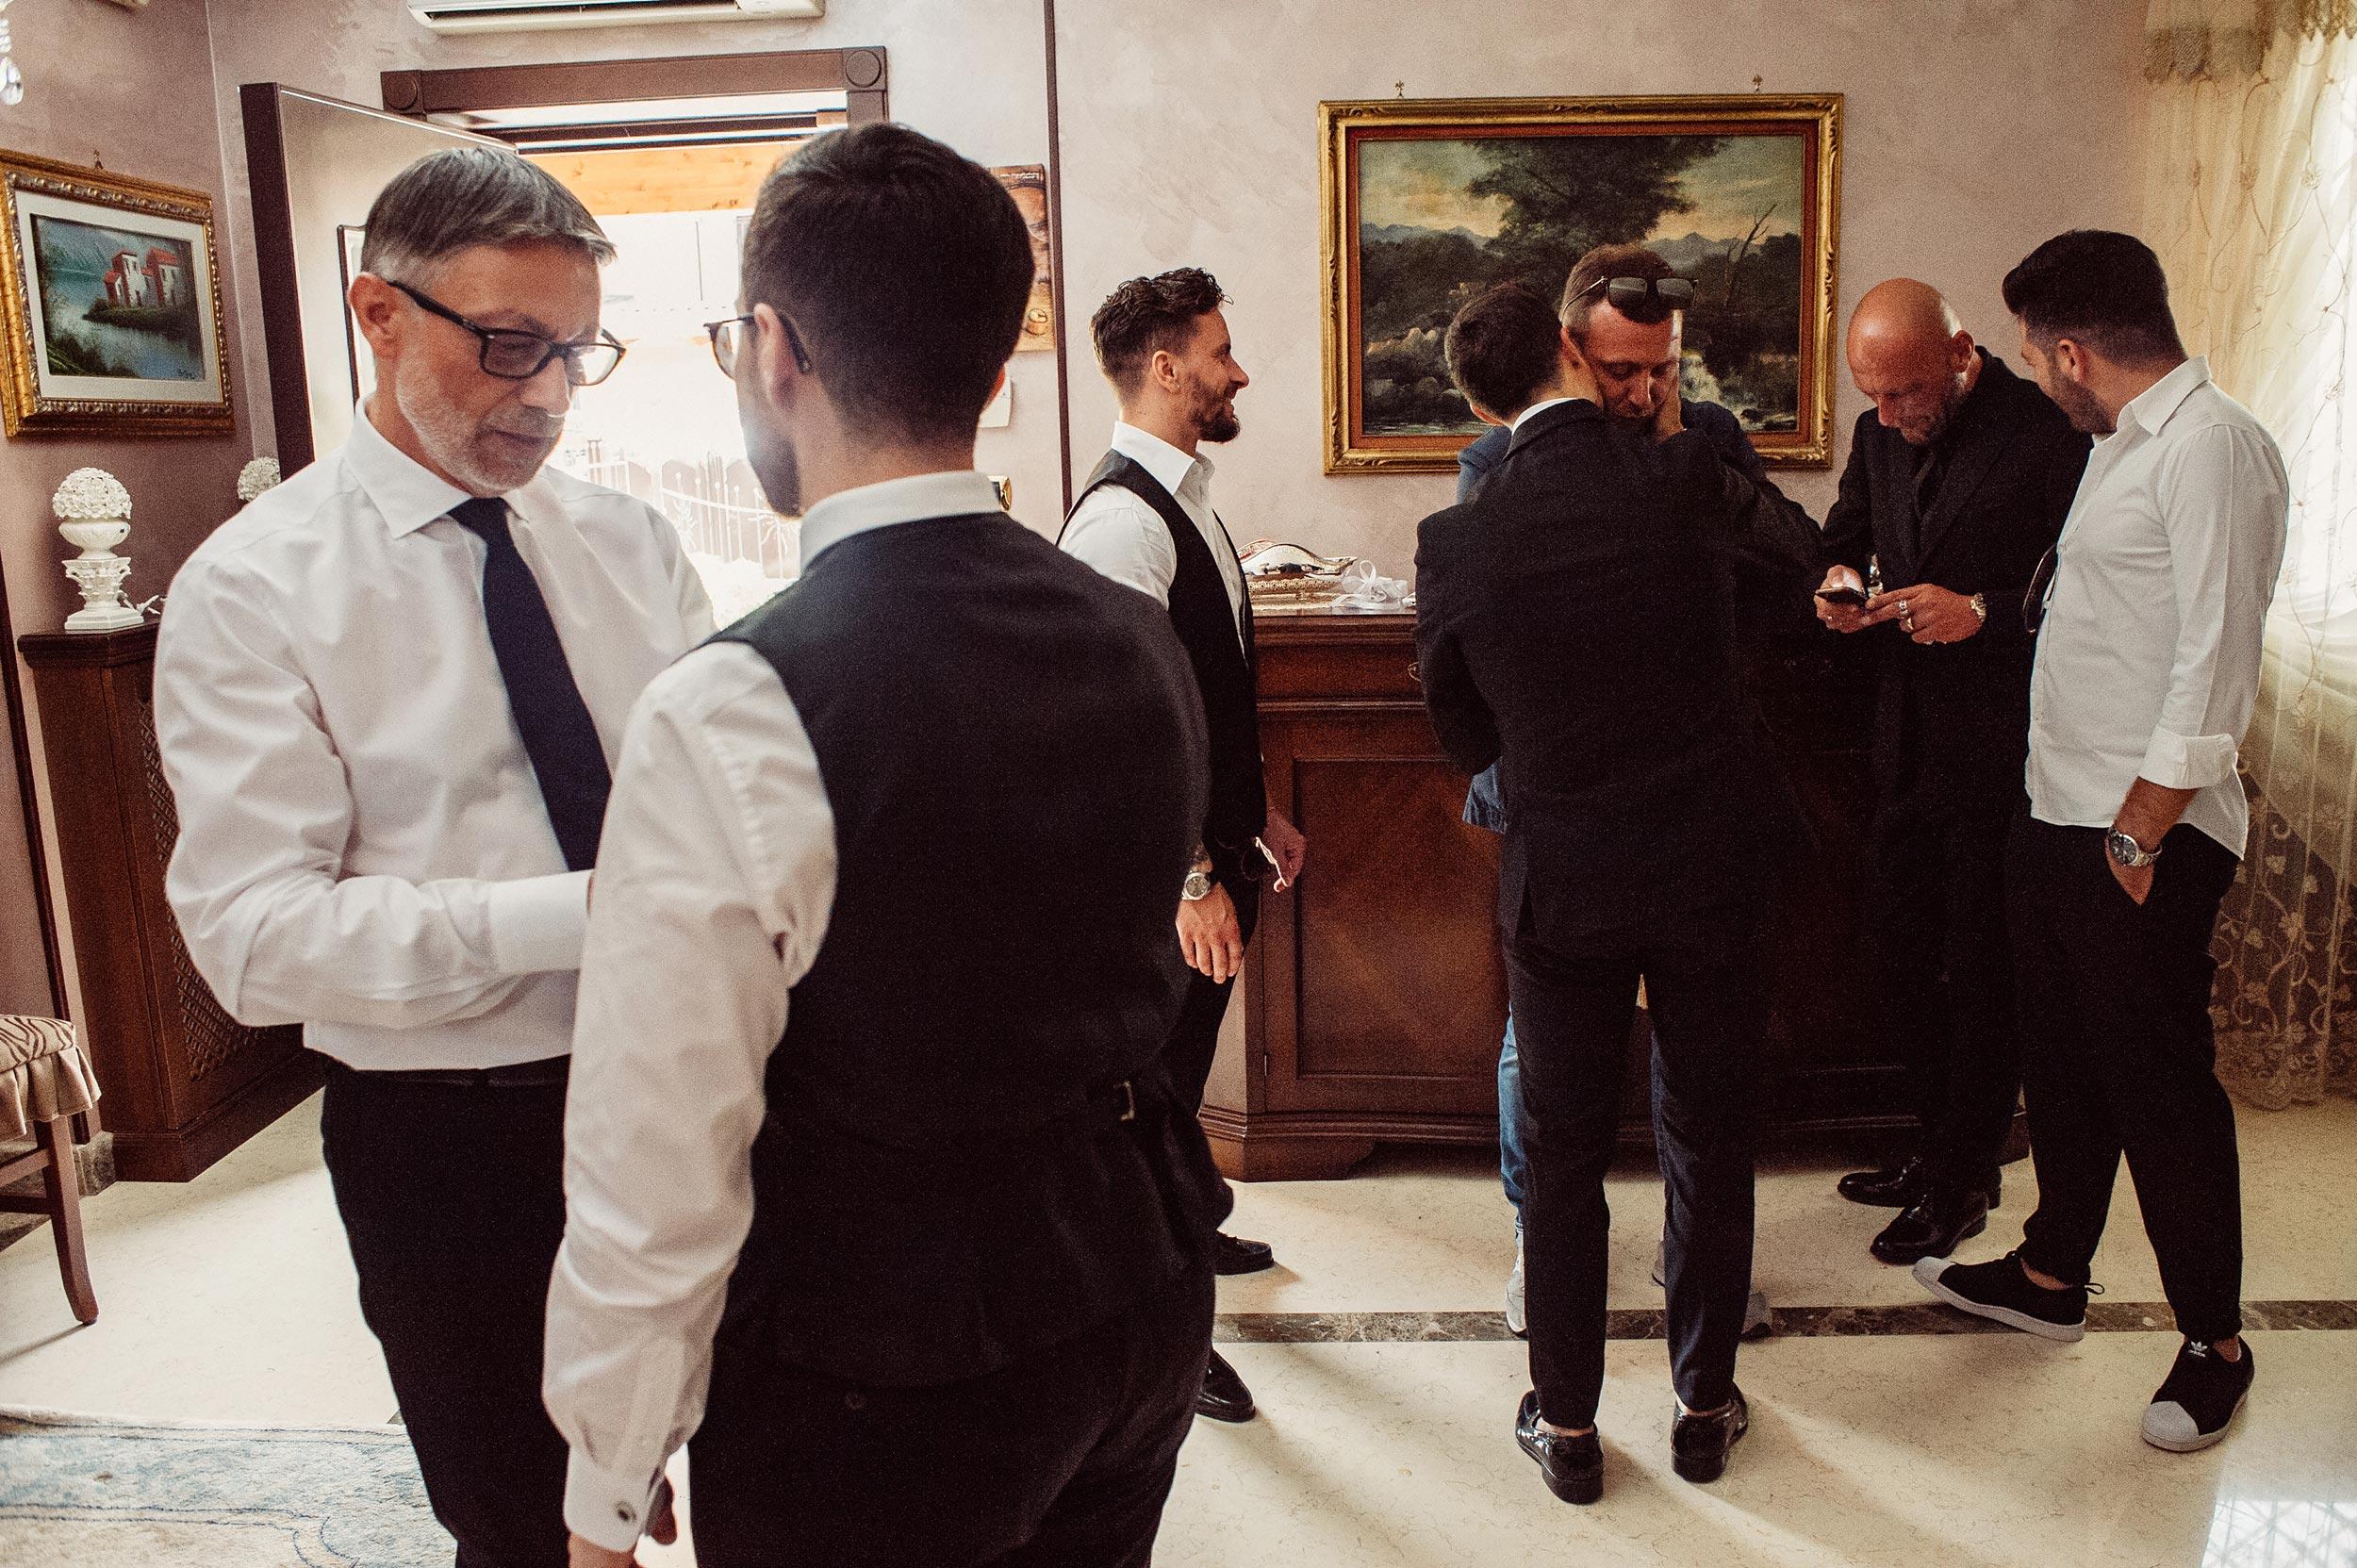 2016-Claudio-Teresa-Naples-Wedding-Photographer-Italy-Alessandro-Avenali-14.jpg